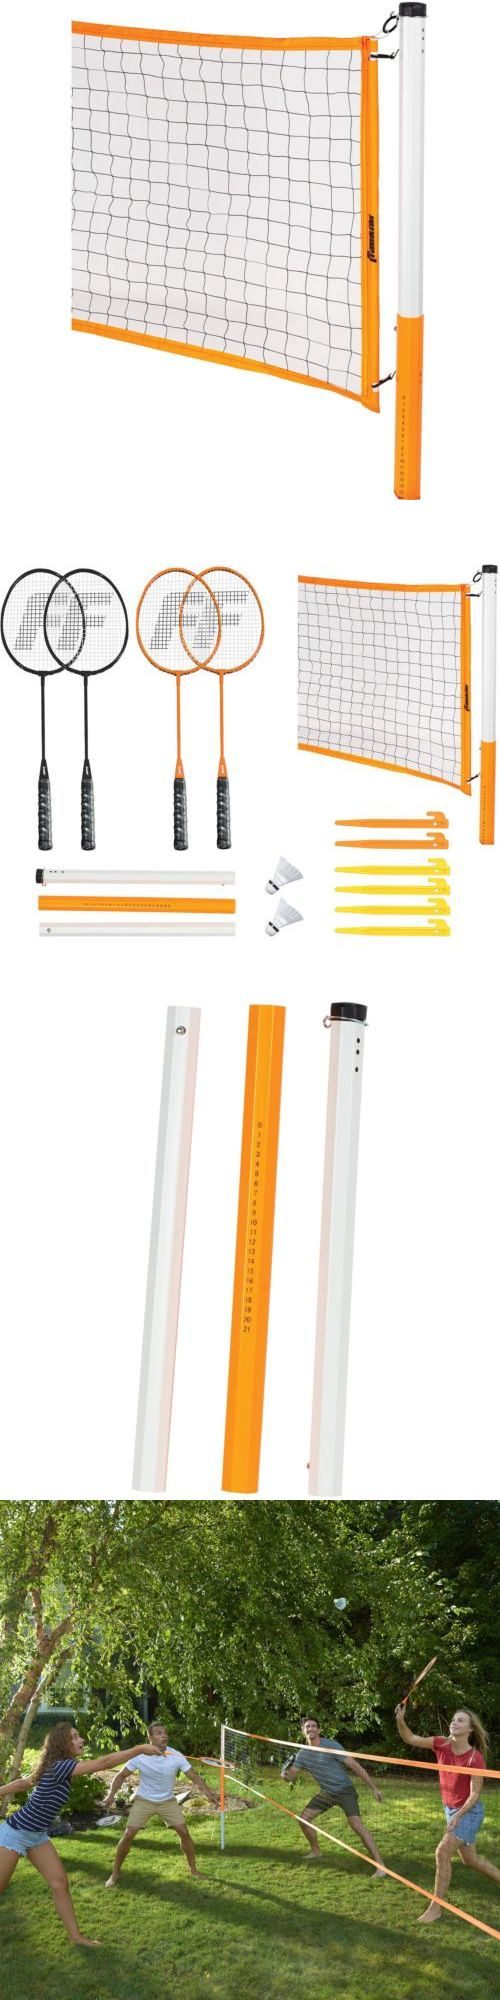 Badminton 106460: Franklin Sports Classic Series Badminton Set -> BUY IT NOW ONLY: $47.98 on eBay!